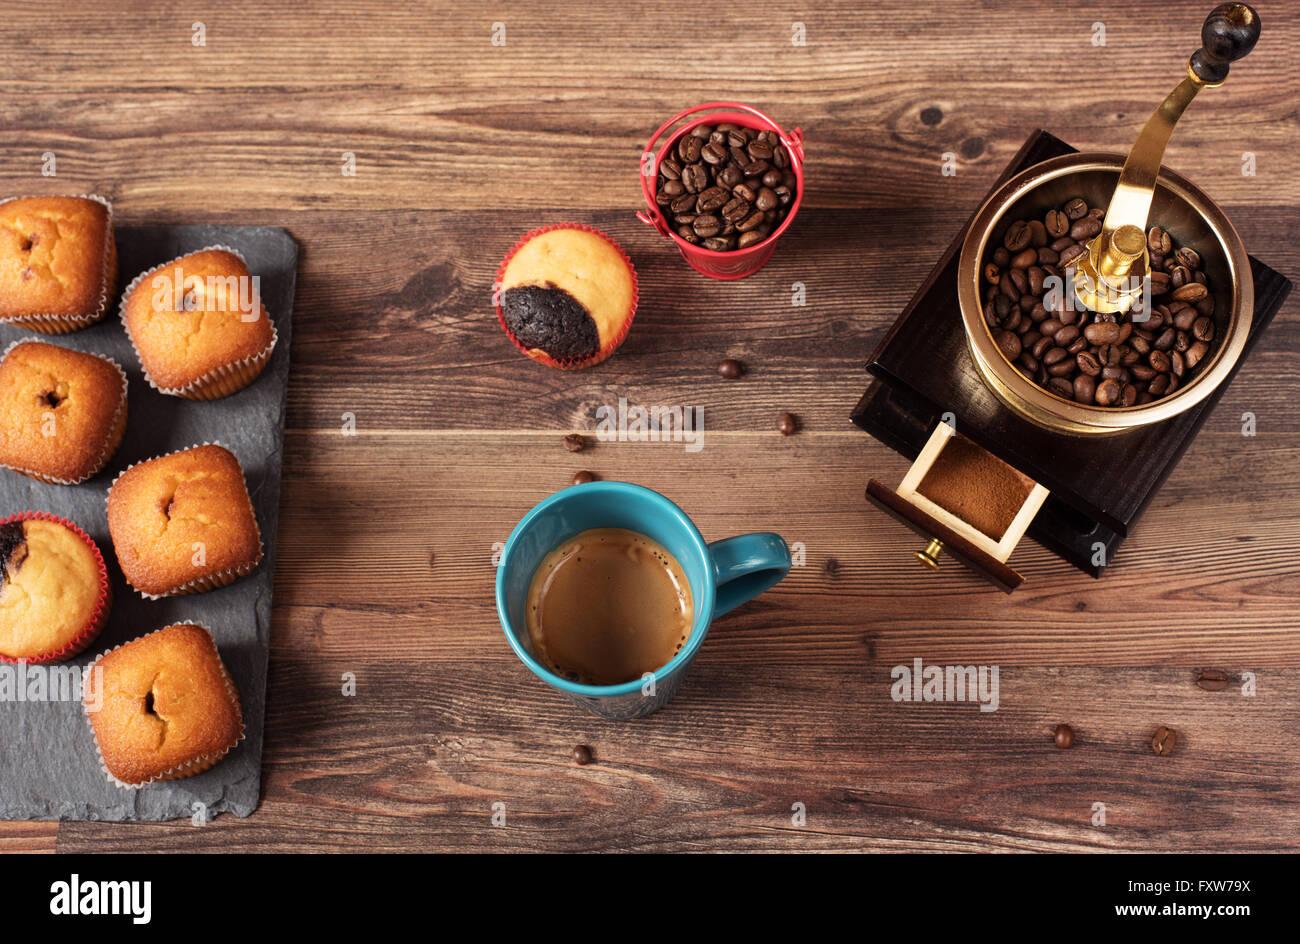 Retrò macinino da caffè, coffee mill tazza da caffè, cioccolato tortina, muffin, i chicchi di caffè. Immagini Stock